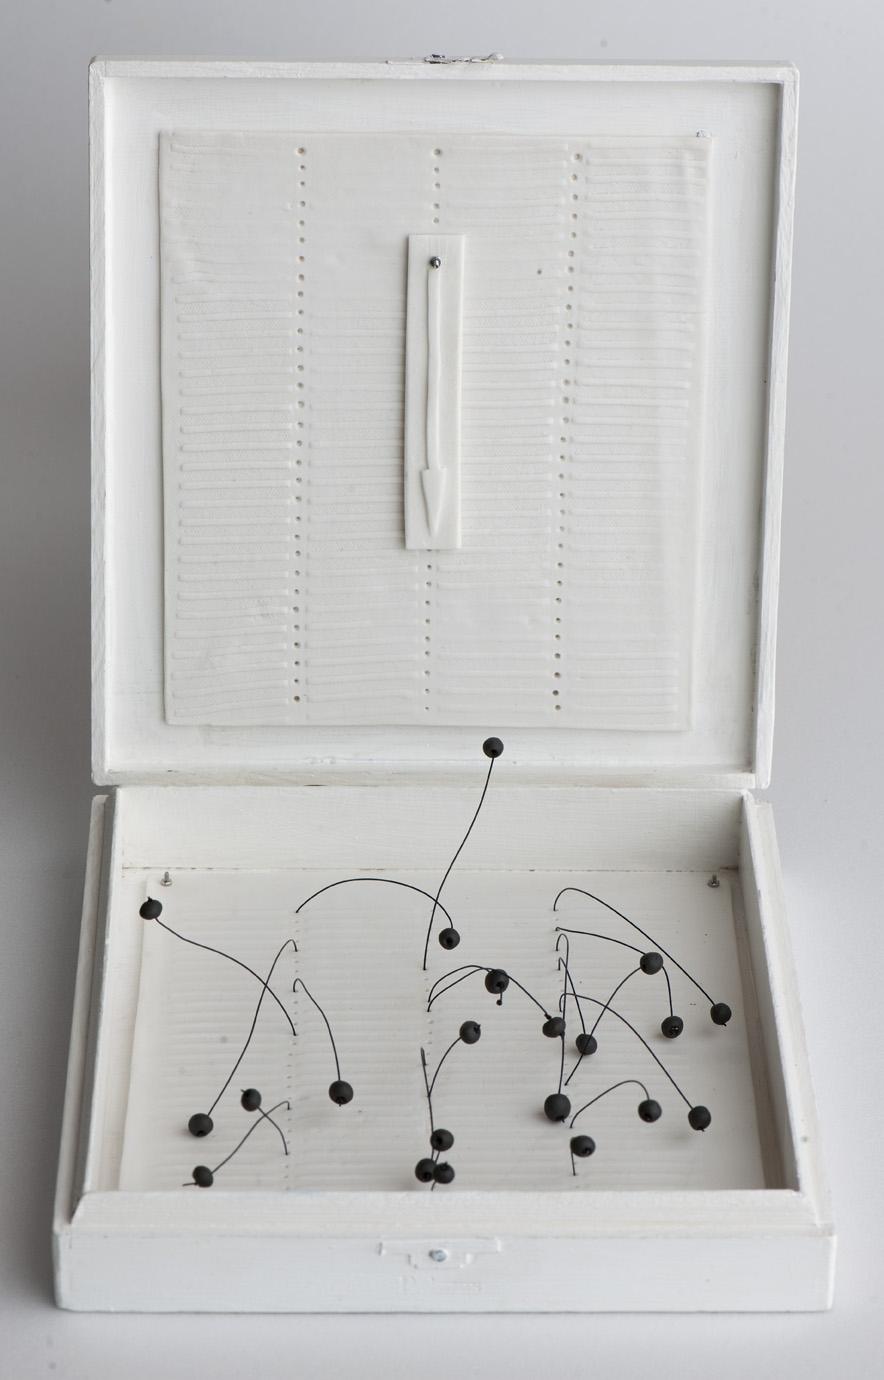 Rilke Hymn Box 11.To keep life Open towards death